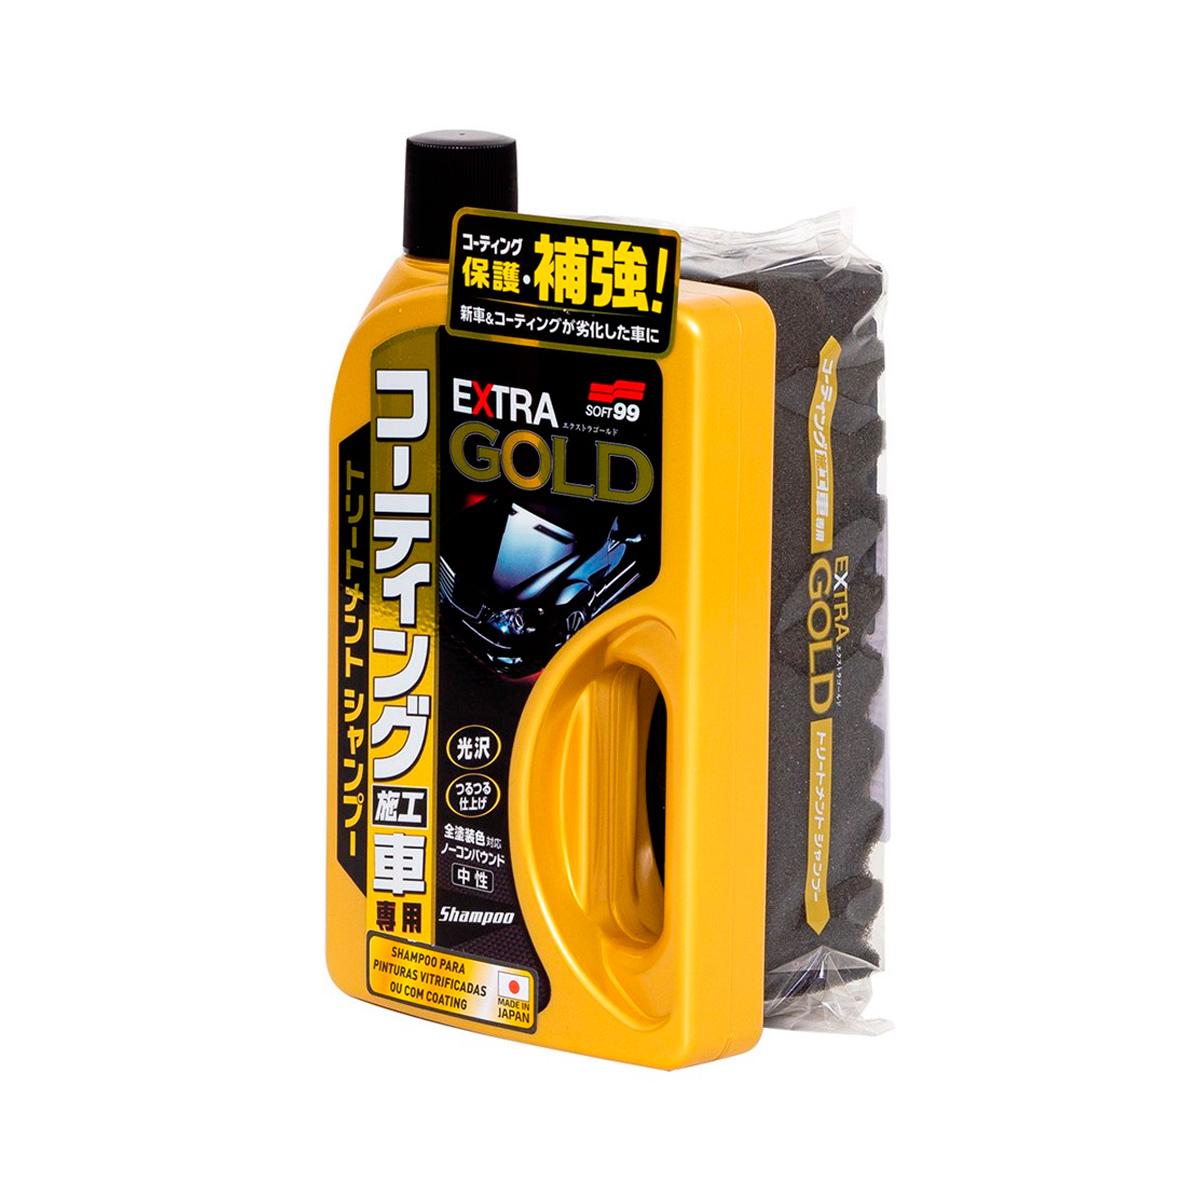 Shampoo Extra Gold 750ml - Soft99